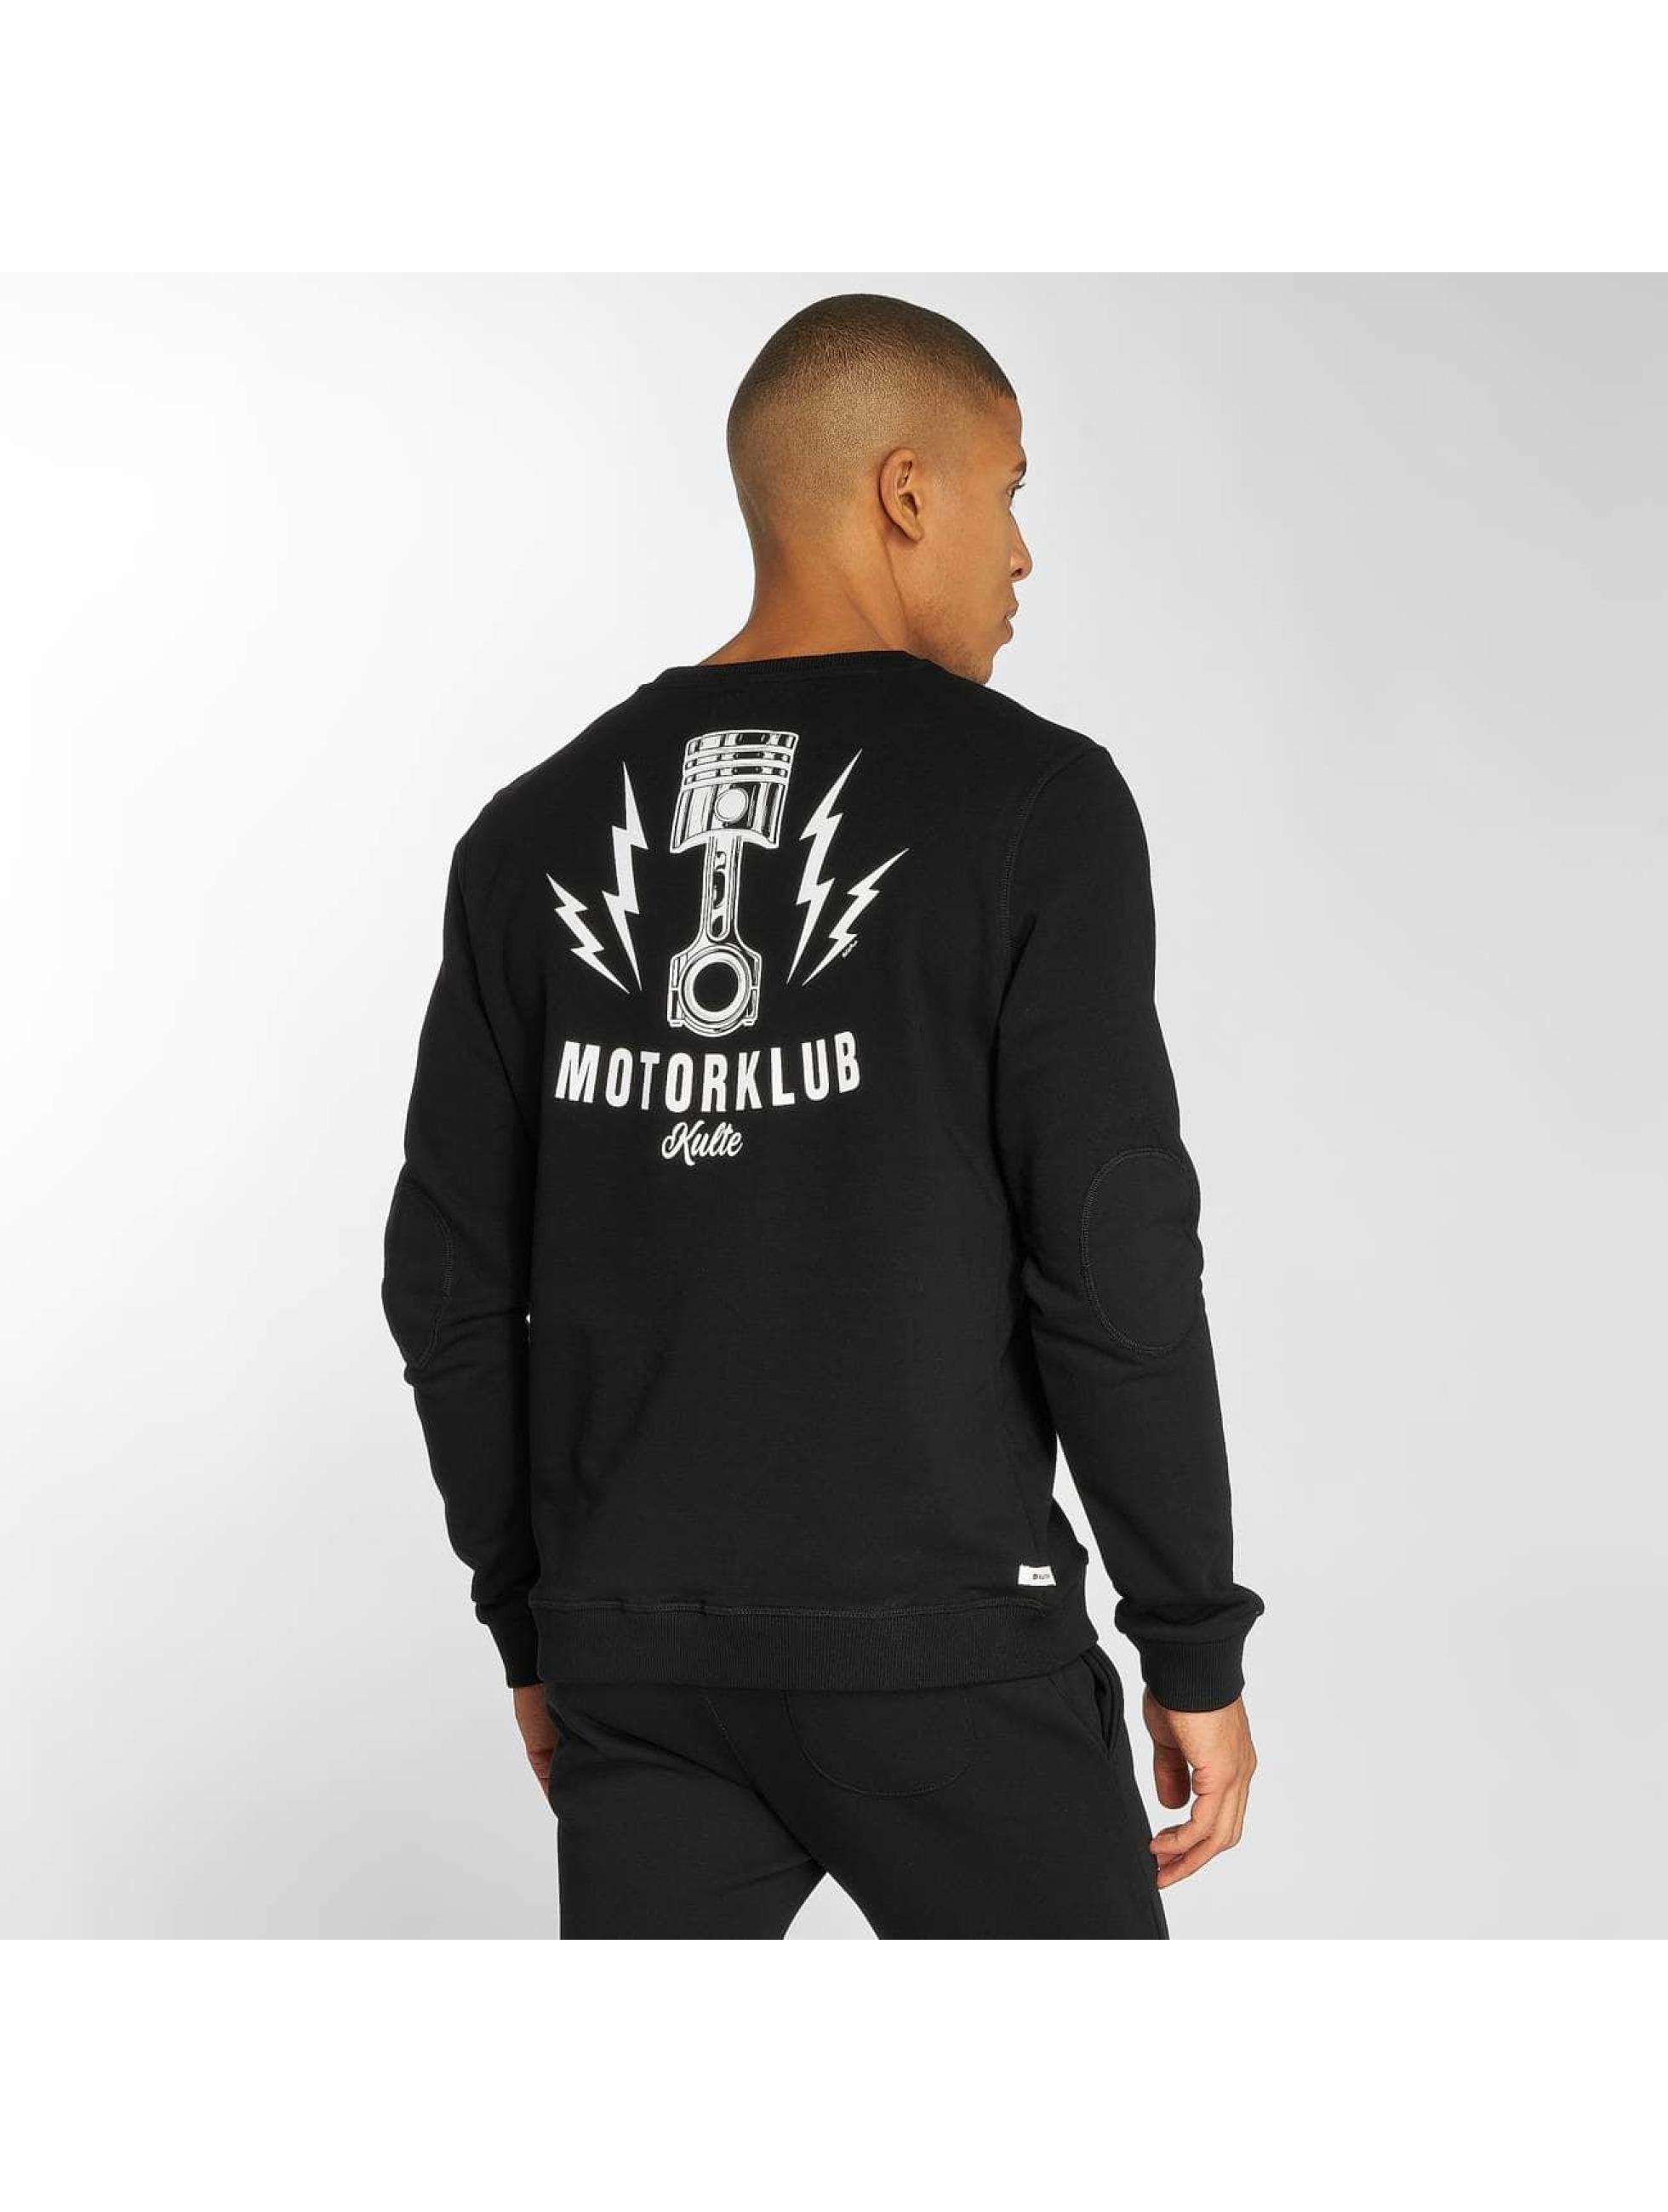 Kulte Jersey Motorklub negro